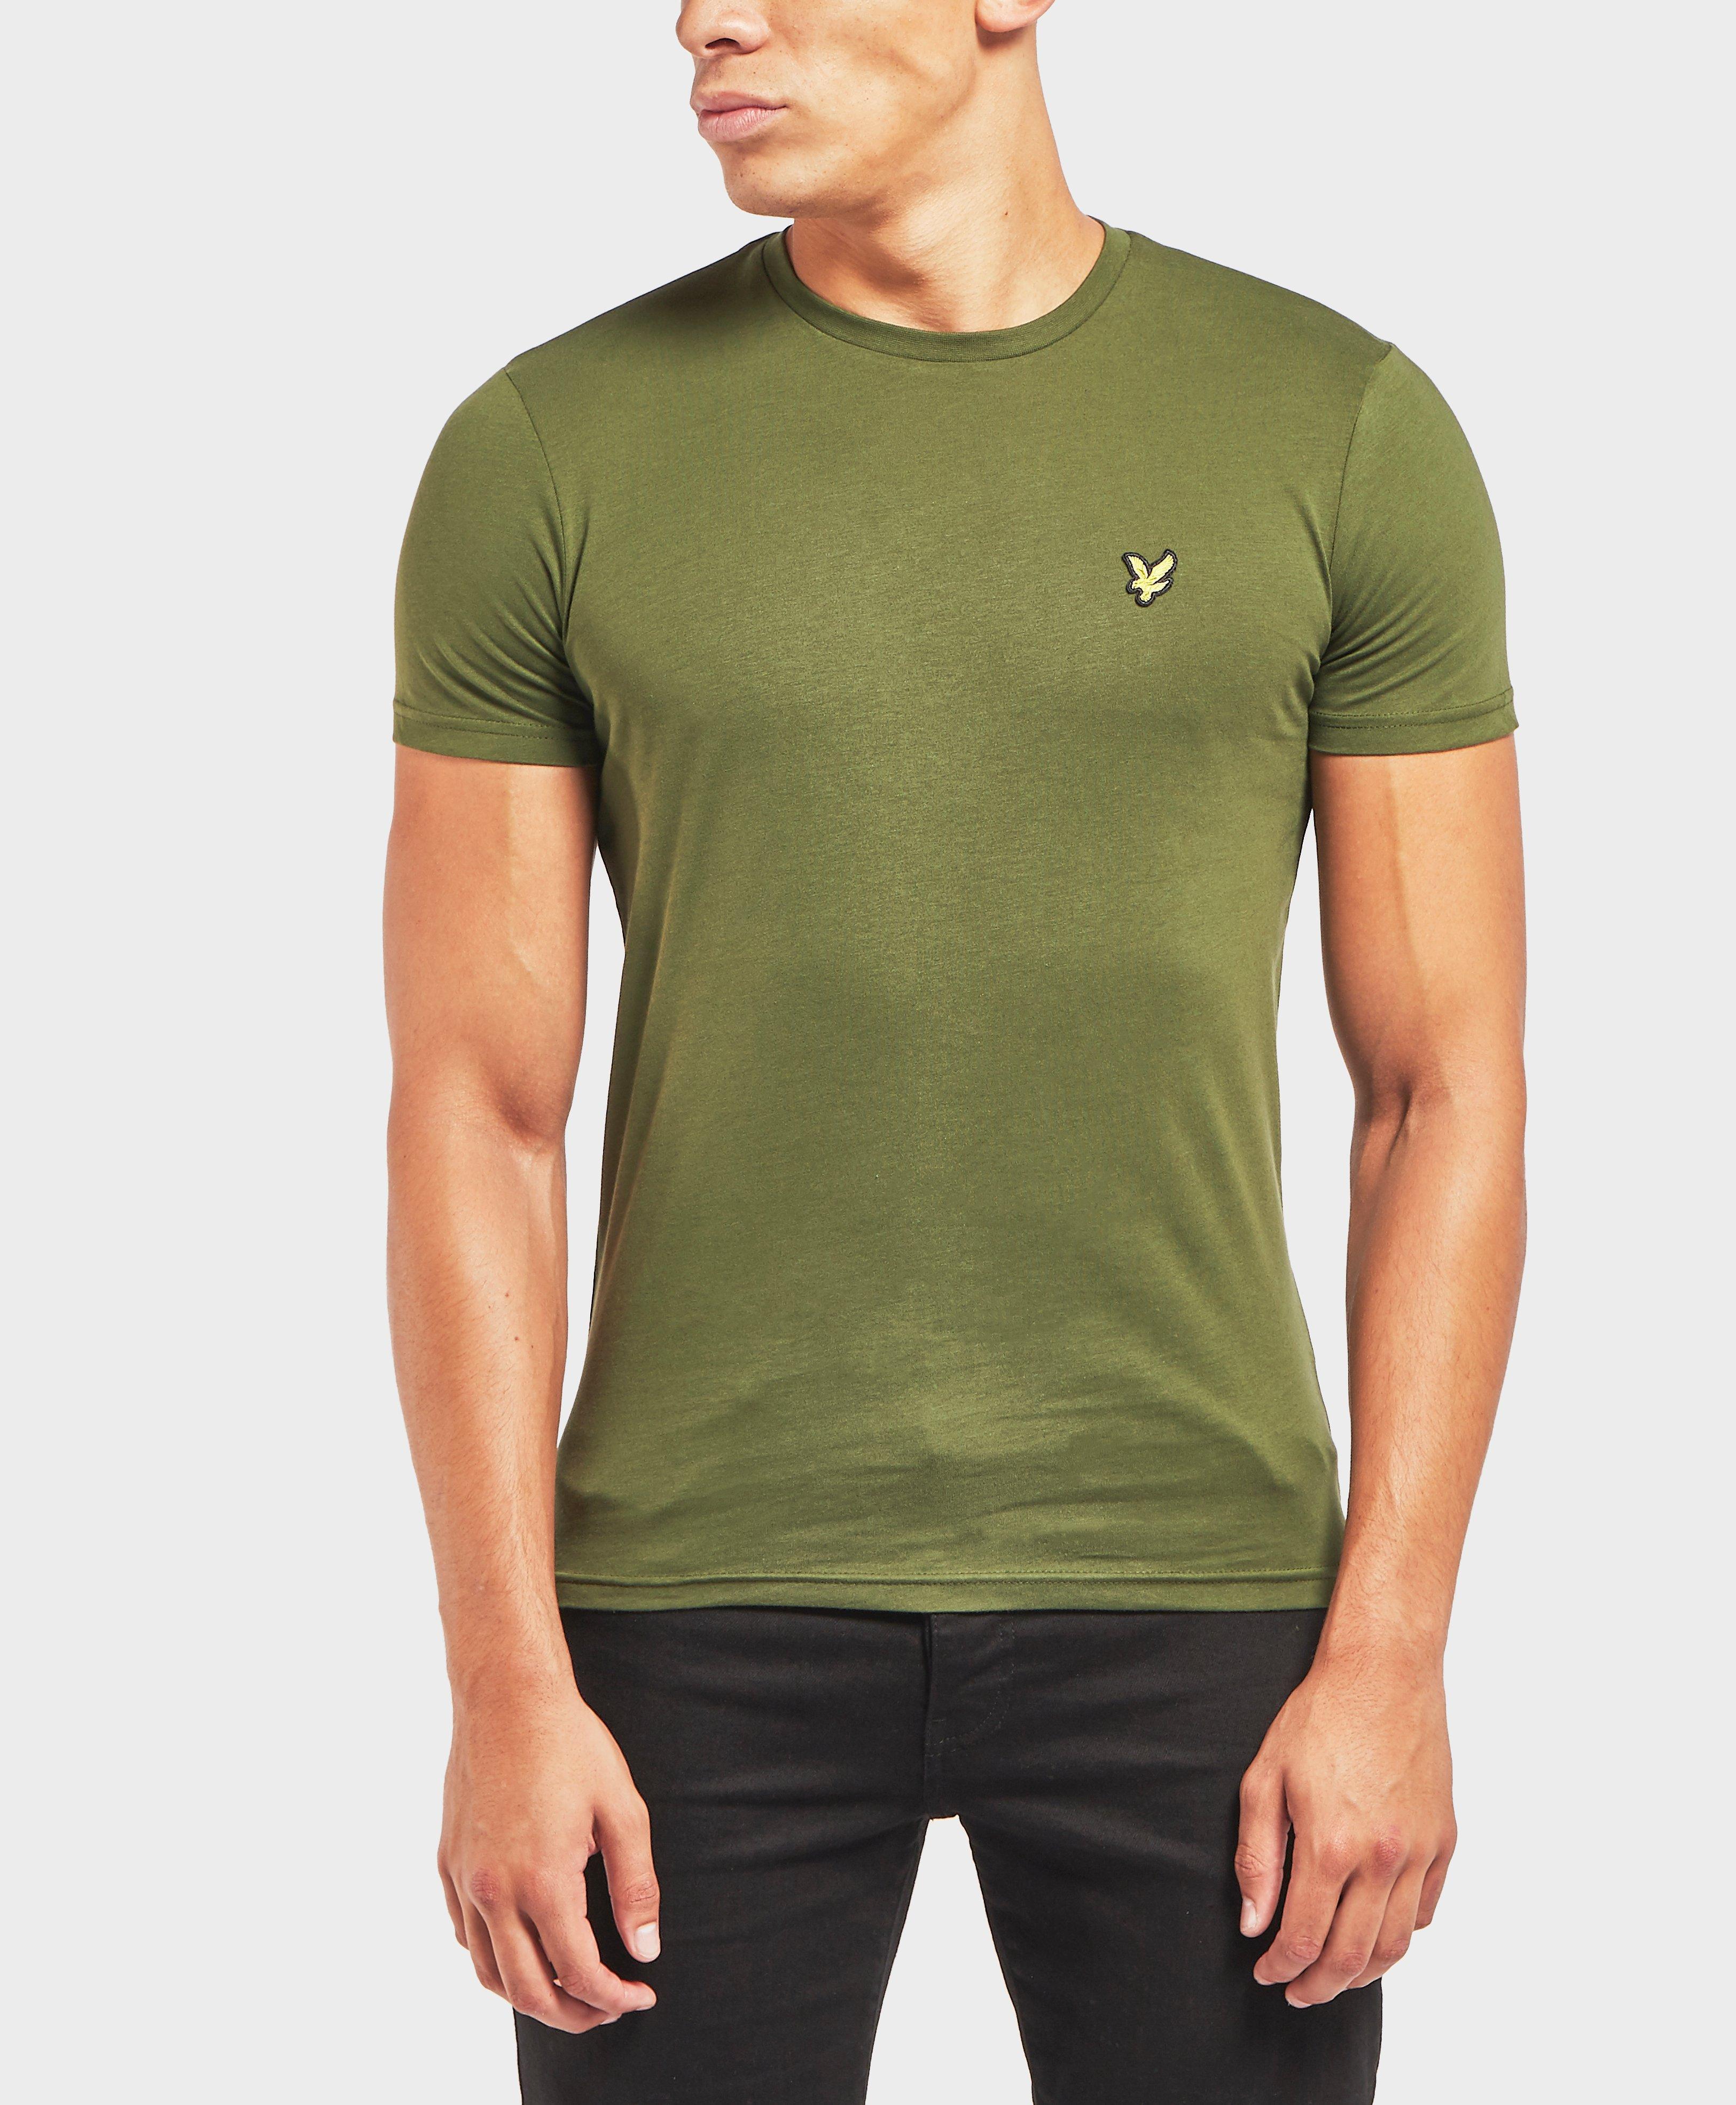 57ebb245e Lyle & Scott Lyle And Scott Crew Neck T-shirt in Green for Men ...